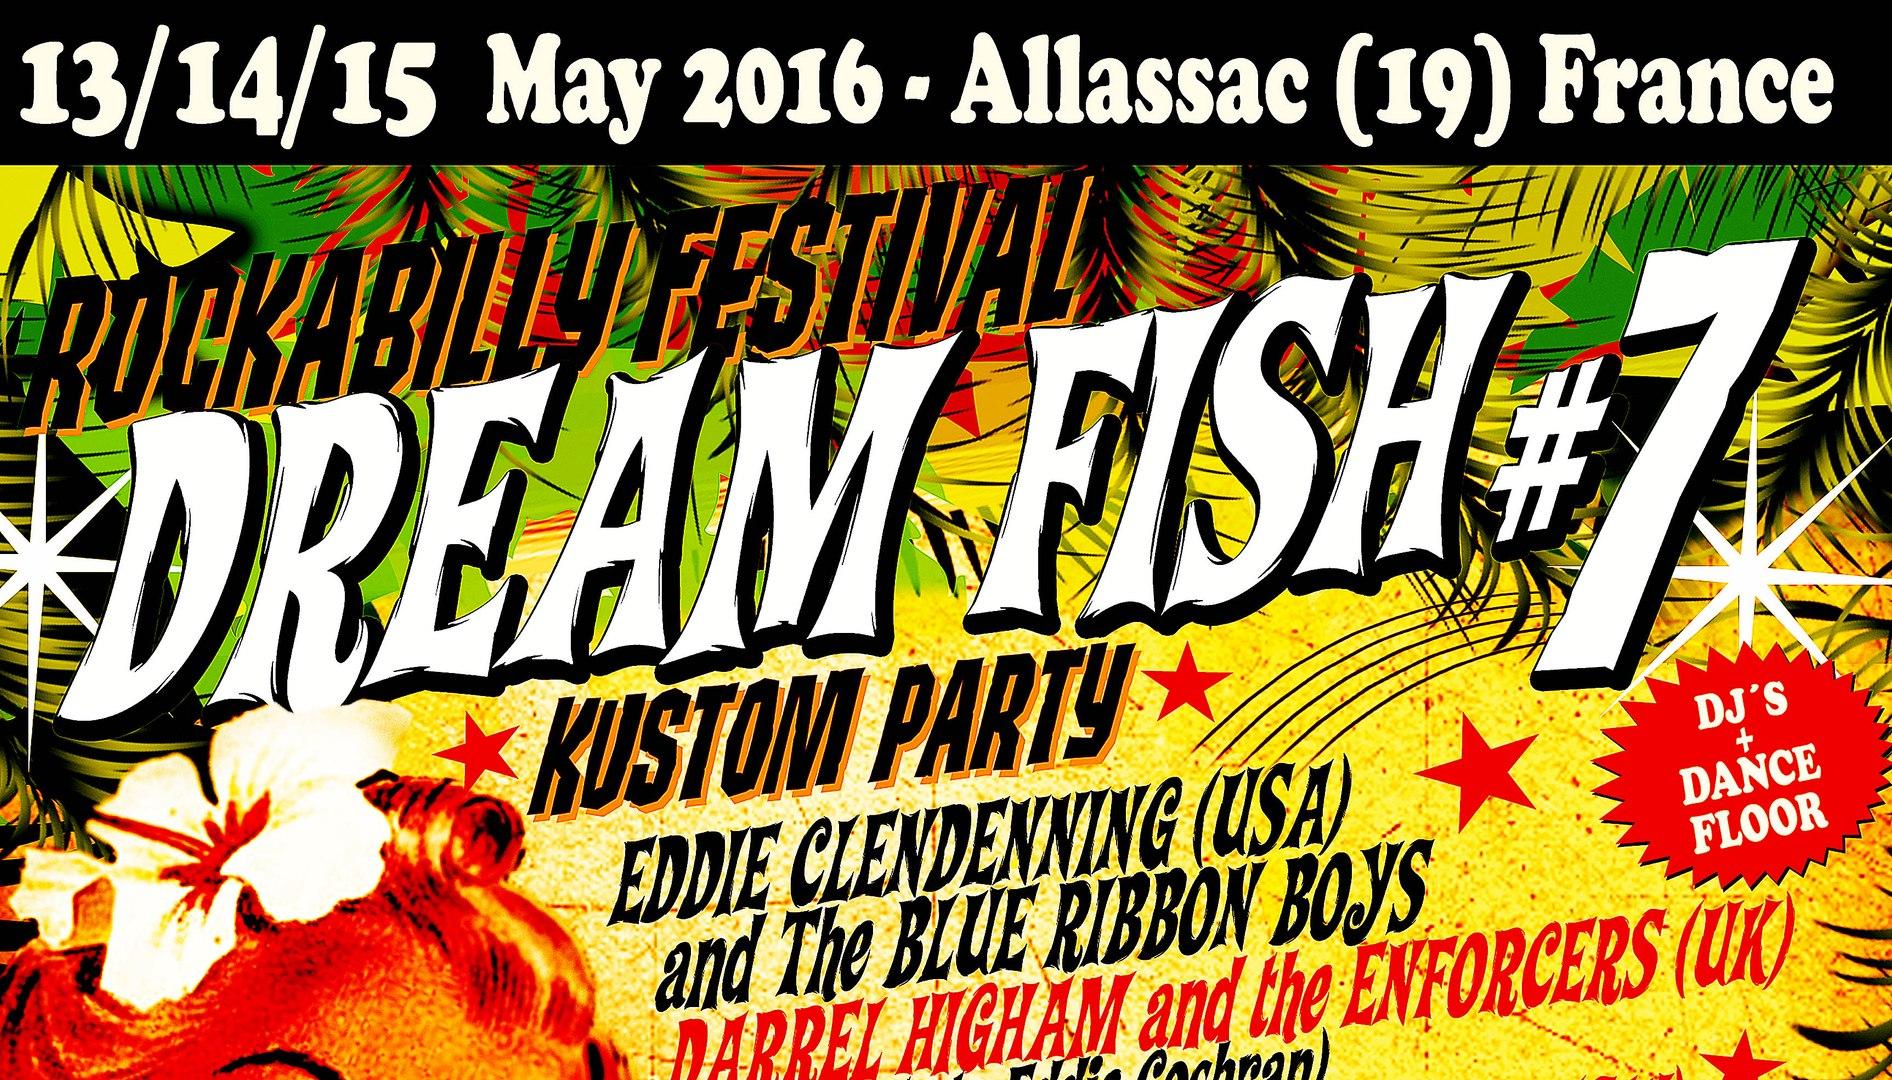 DREAM FISH KUSTOM PARTY n°7 TRAILER